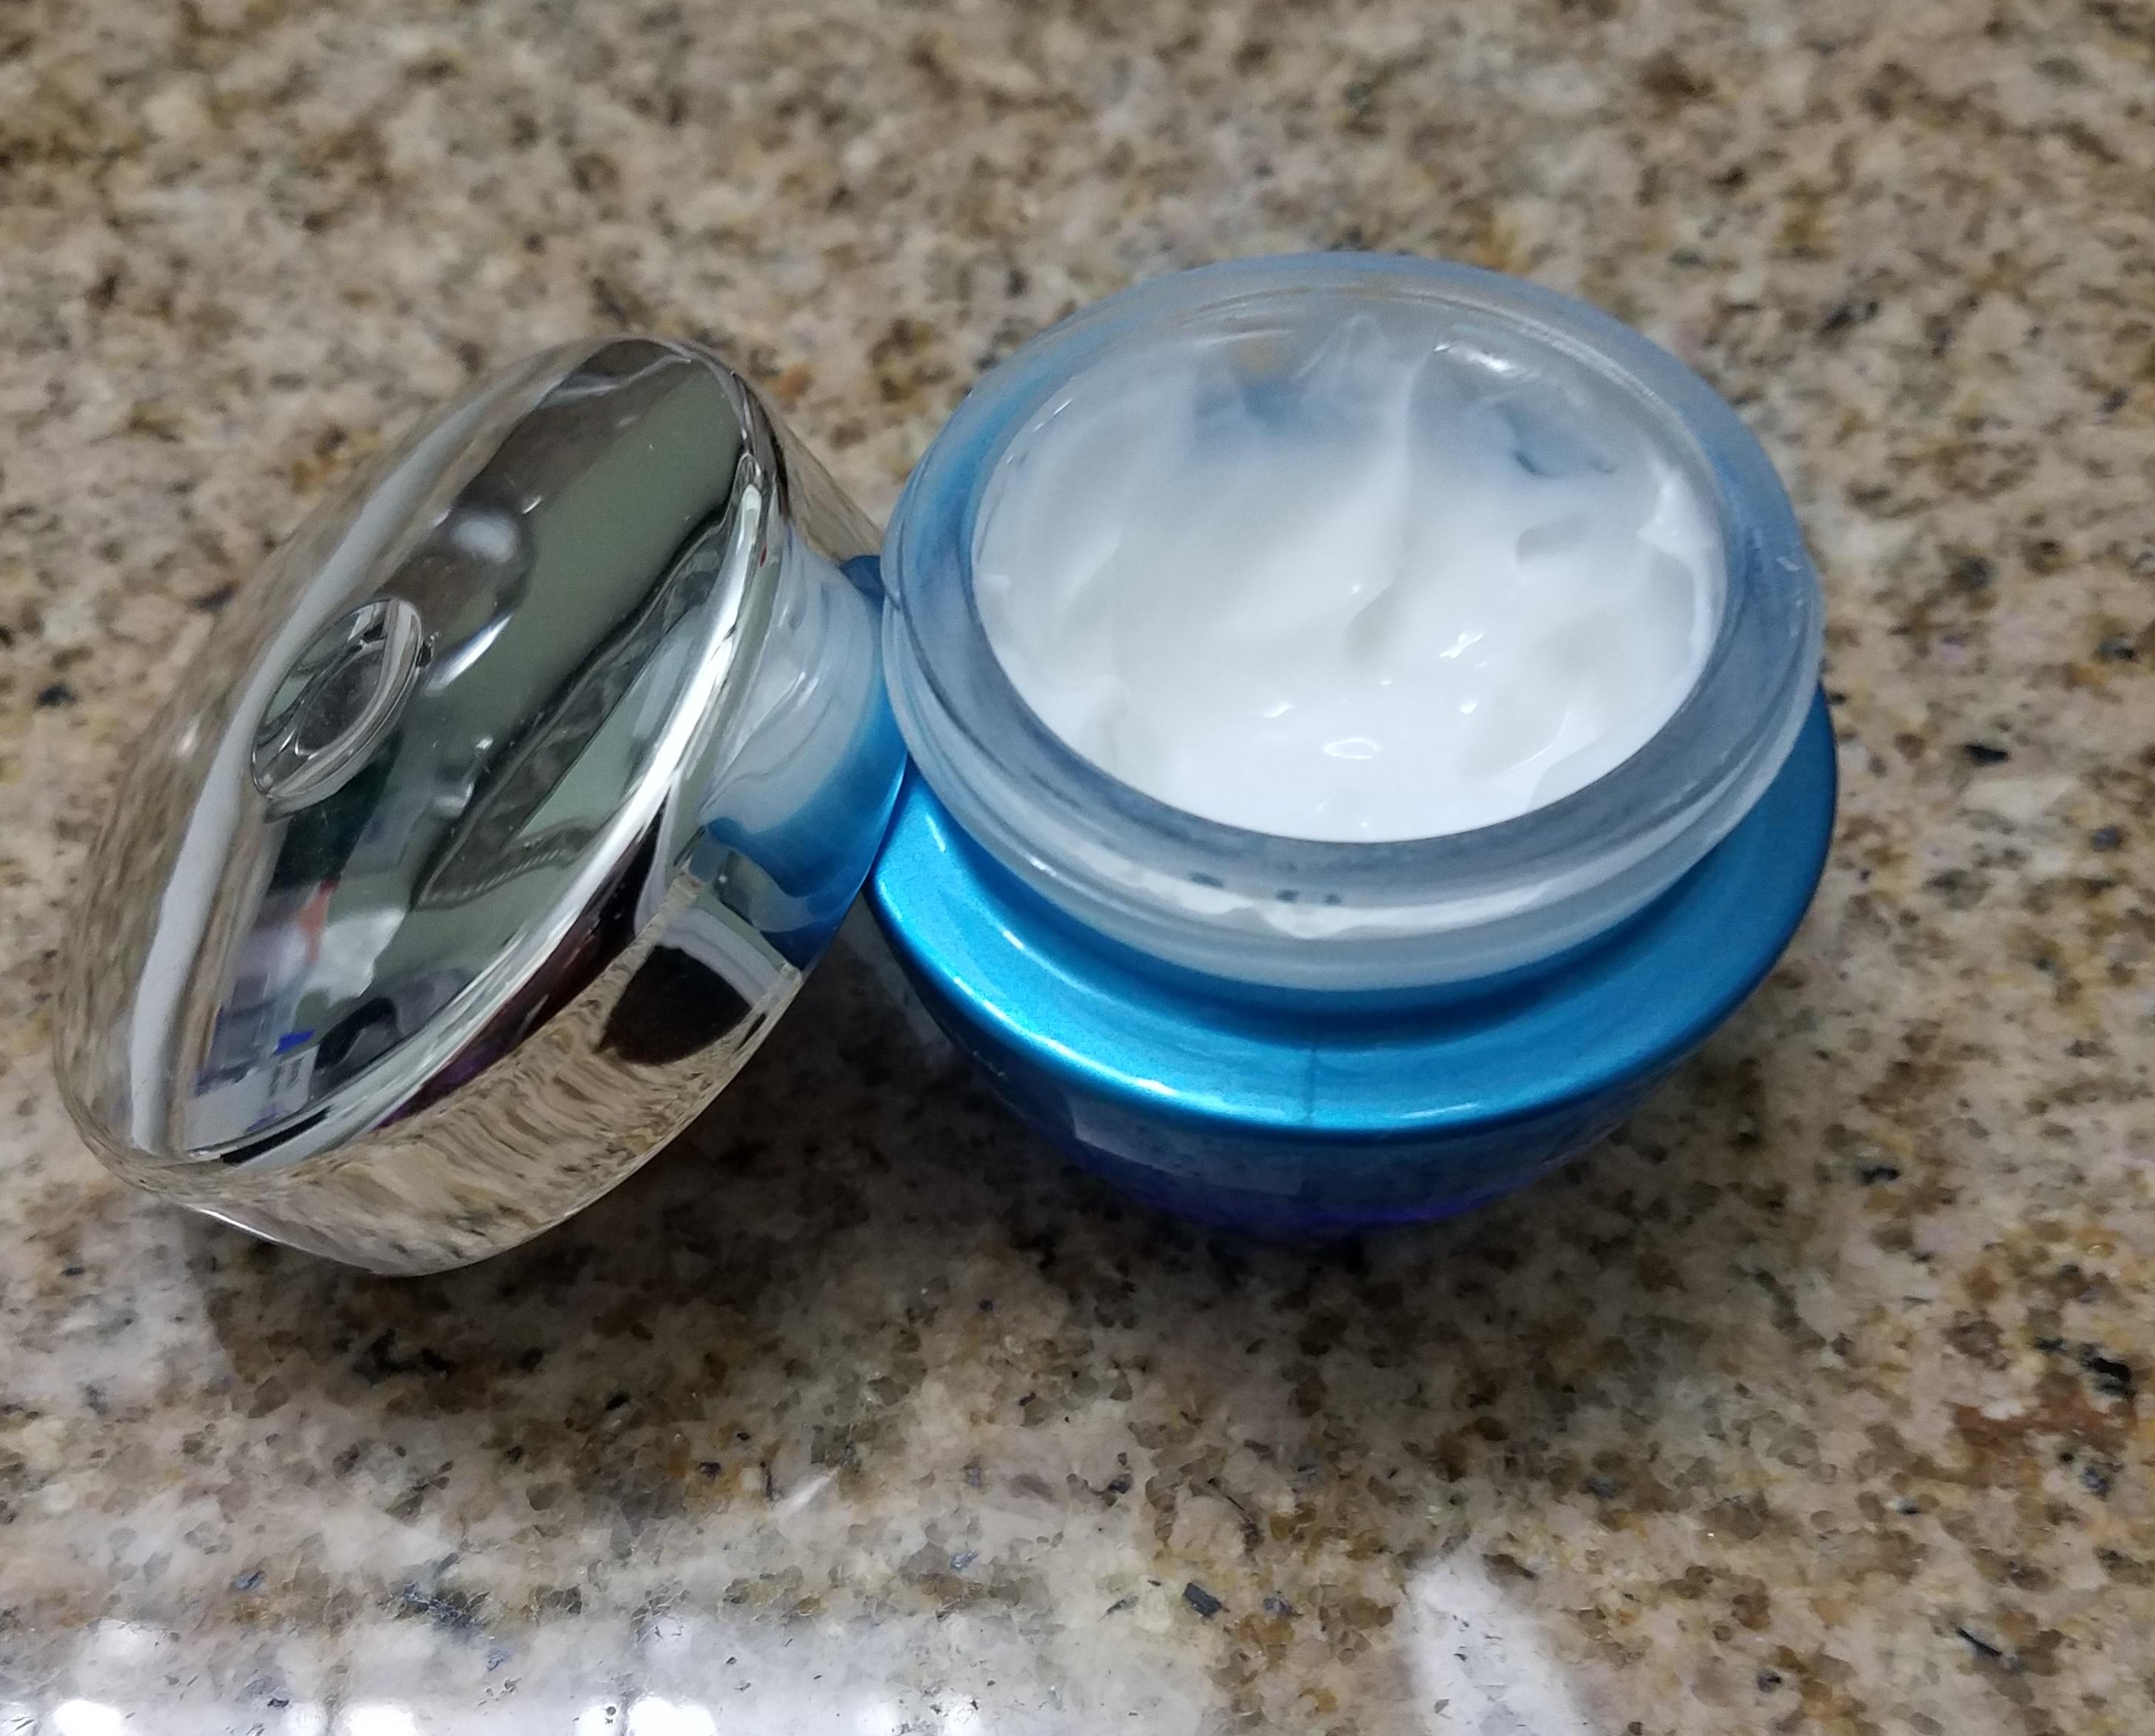 Blue jar recover cream 2019-10-06 20.59.23